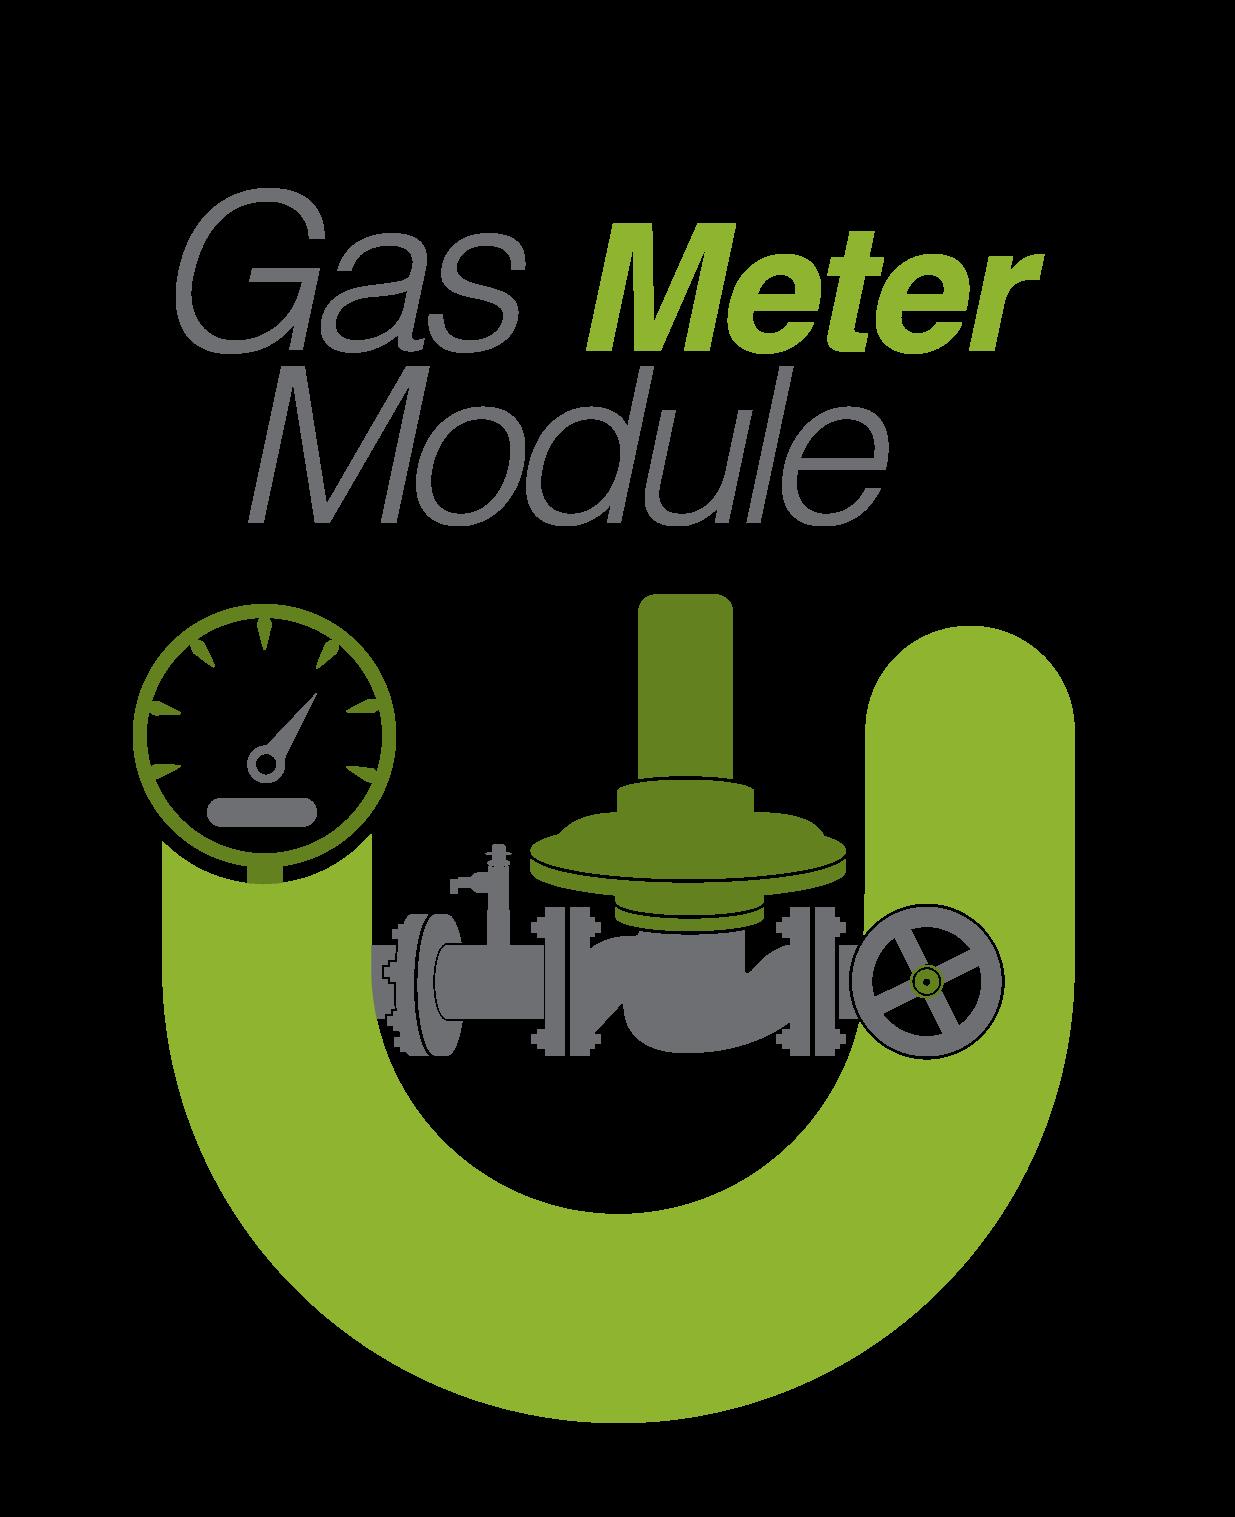 Gas clipart nitrogen gas. Igtm ct turbine meter